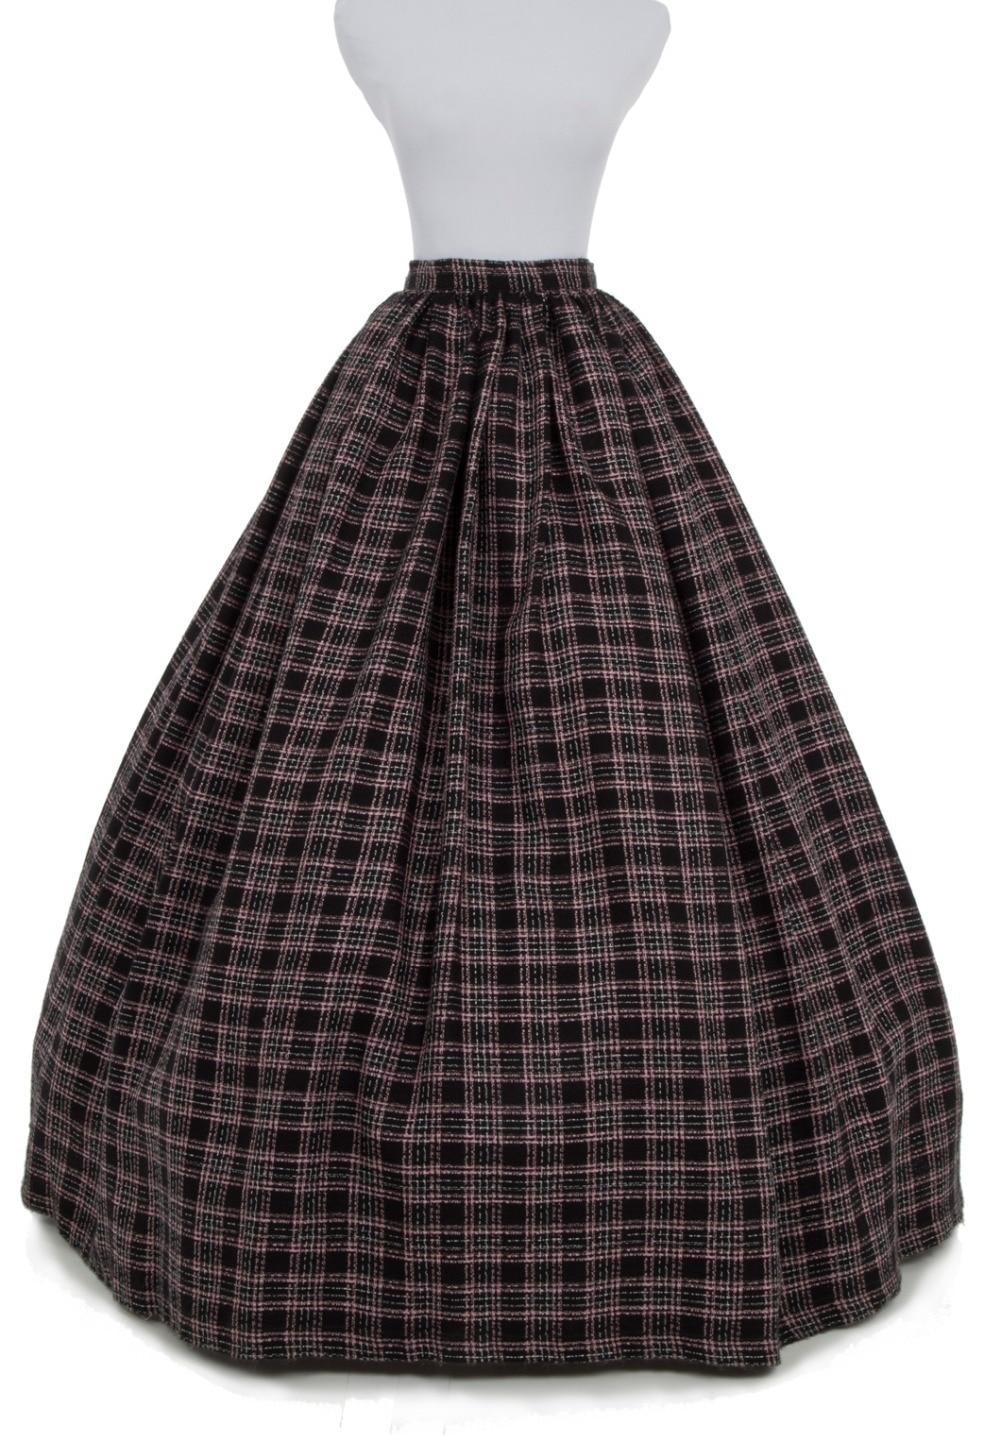 Aliexpress.com : Buy Plaid Fashion Microfiber Wool Floor Length ...